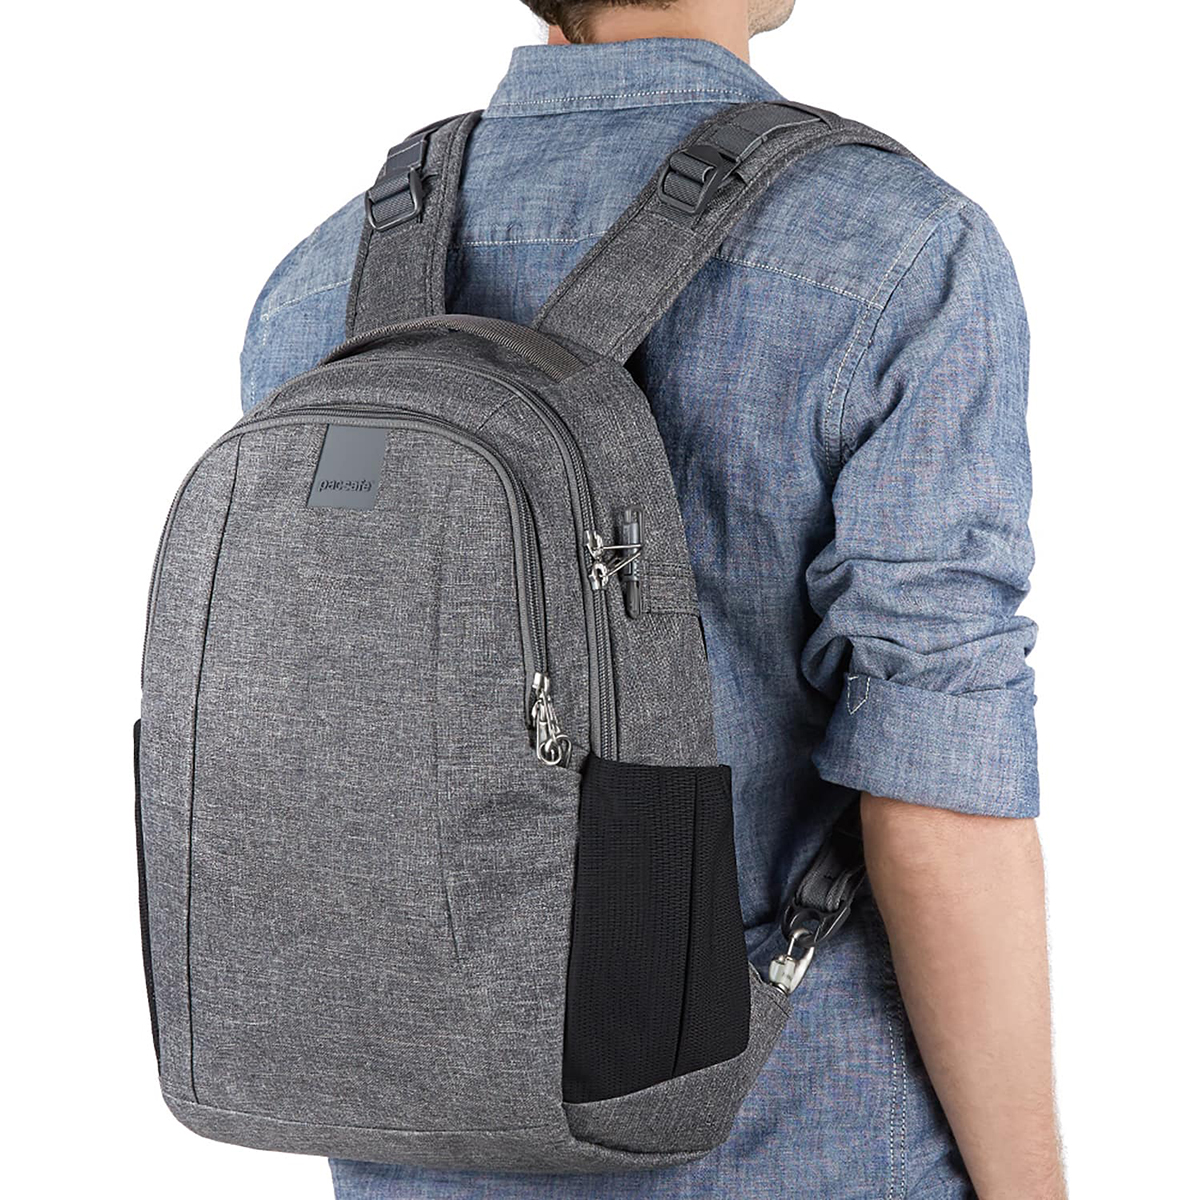 PacSafe-MetroSafe-LS350-Anti-Theft-15L-Backpack miniature 11